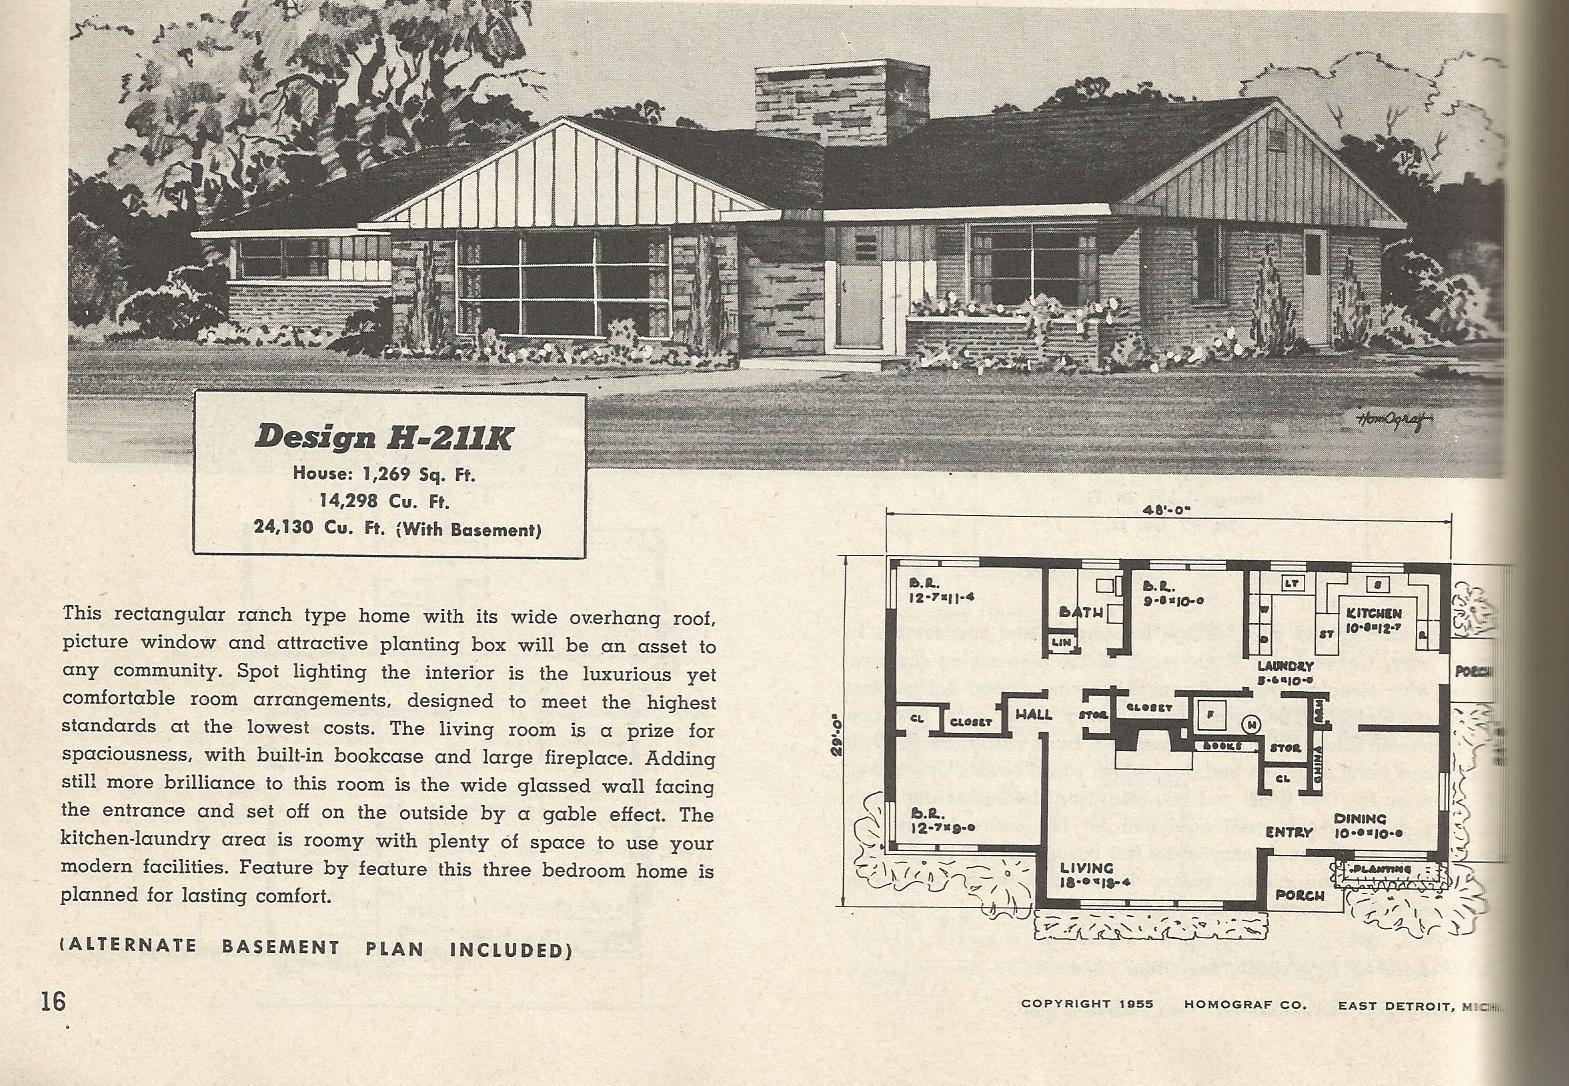 Vintage house plans 211 antique alter ego for Antique house plans